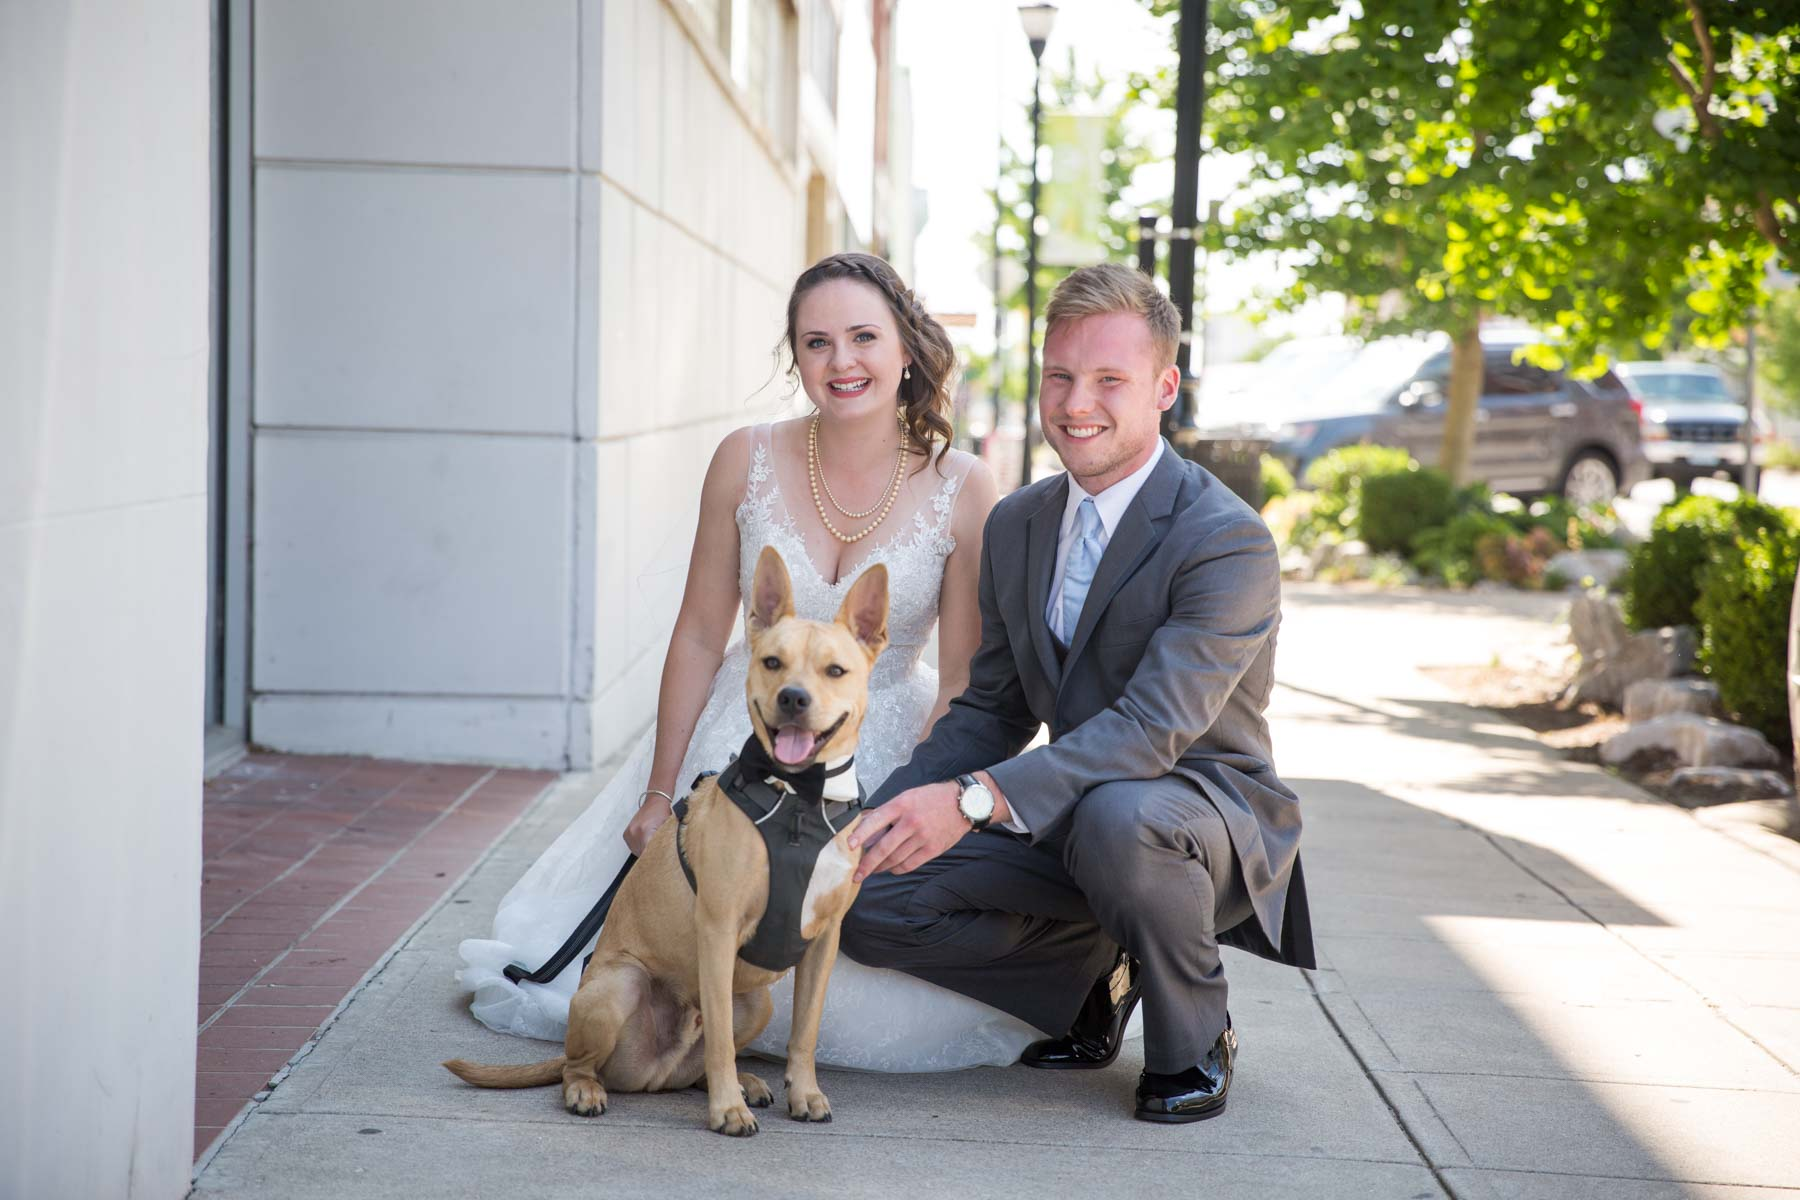 wedding dog-1.jpg